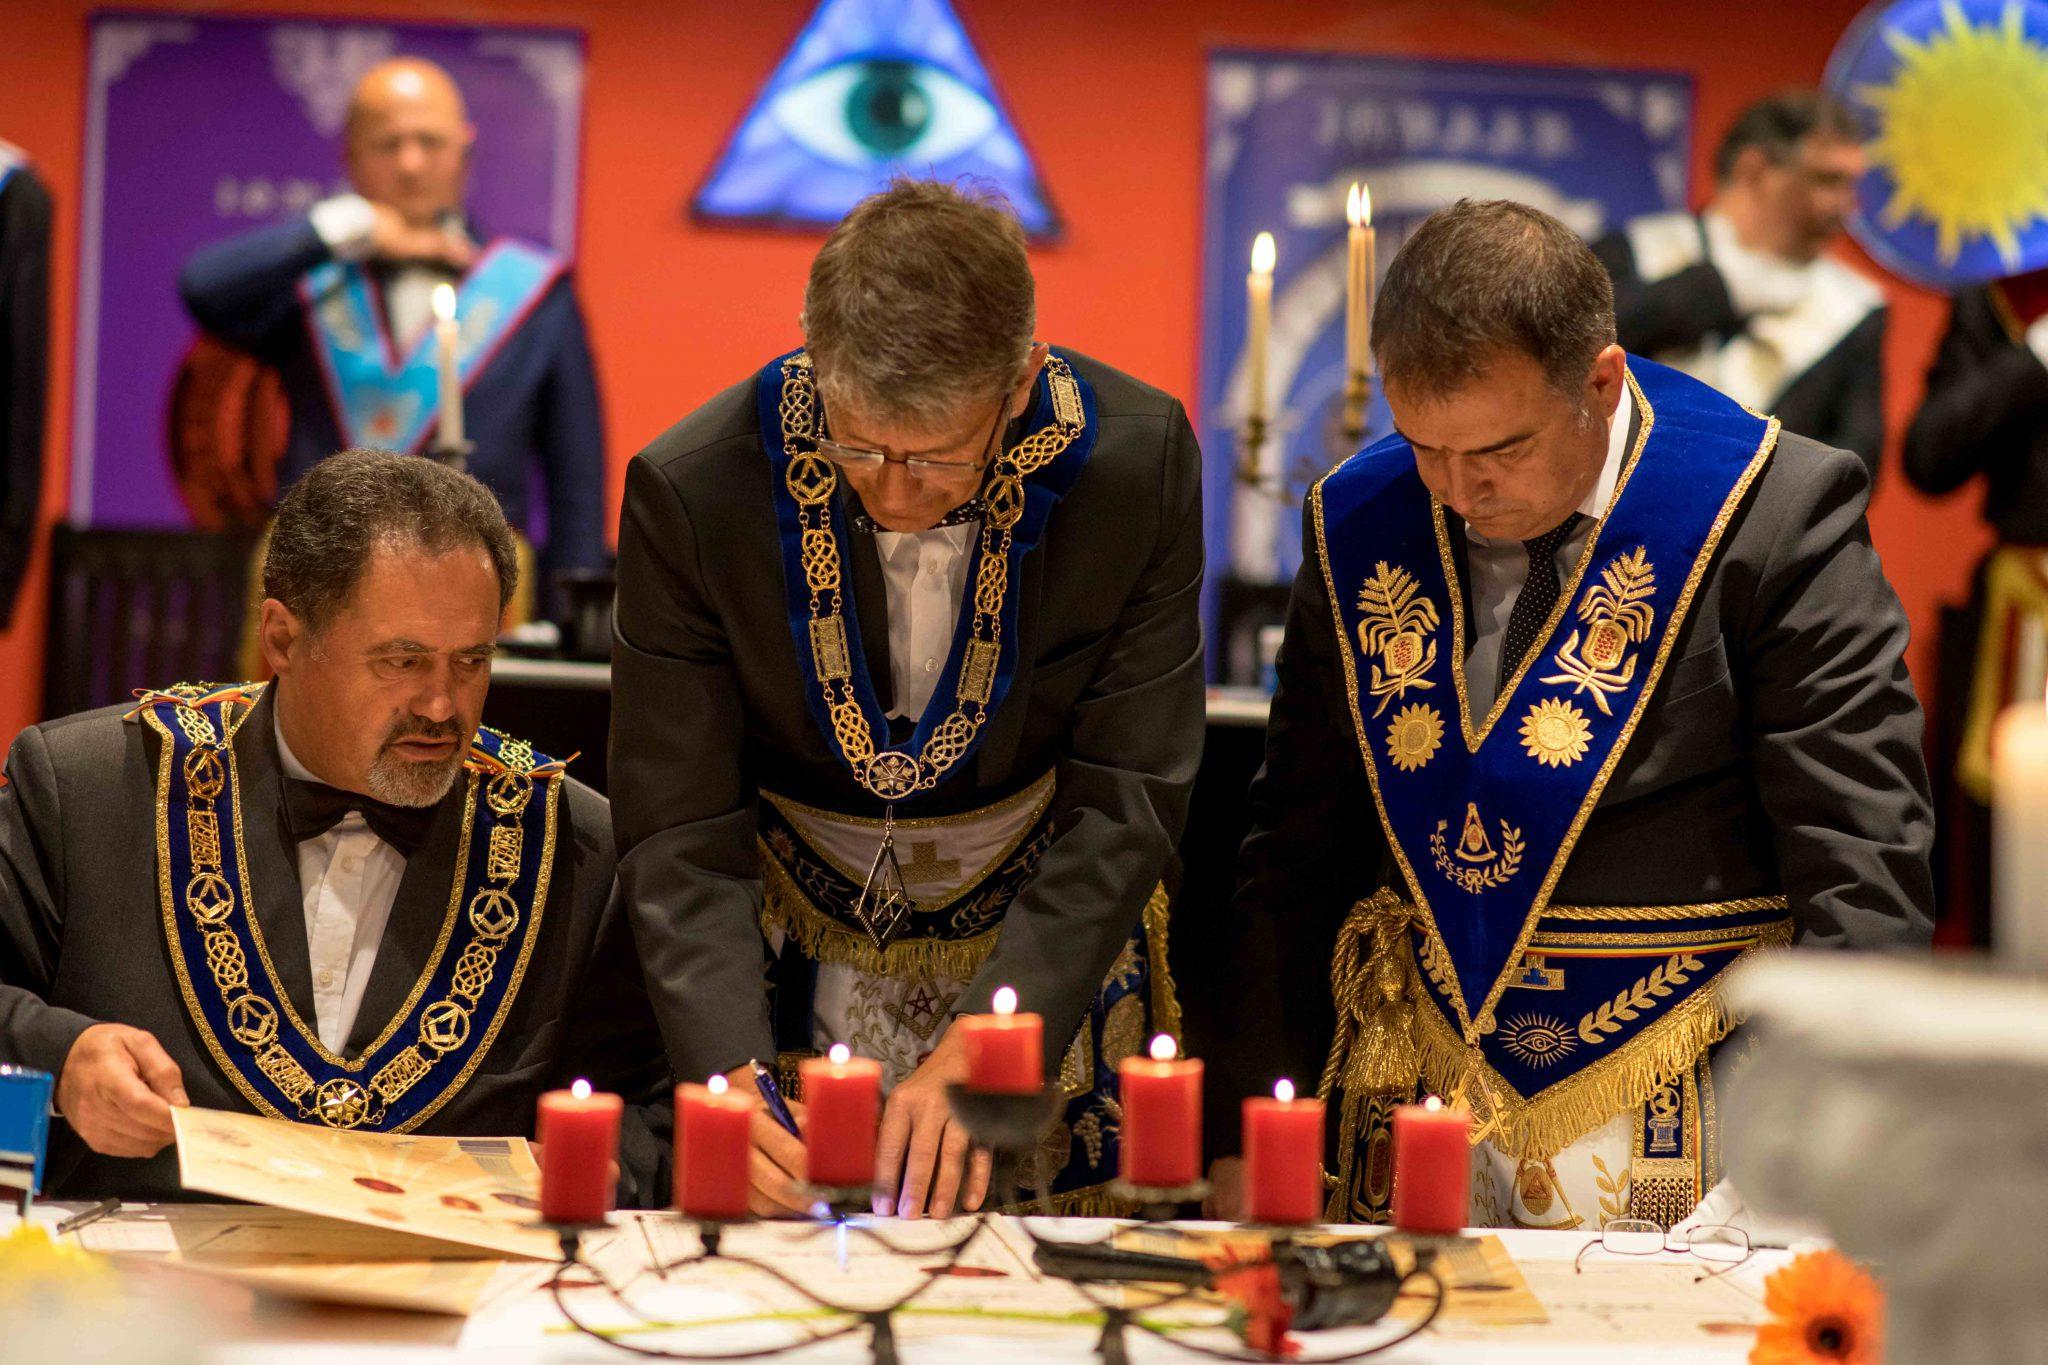 Union of Grand Lodge of Romania